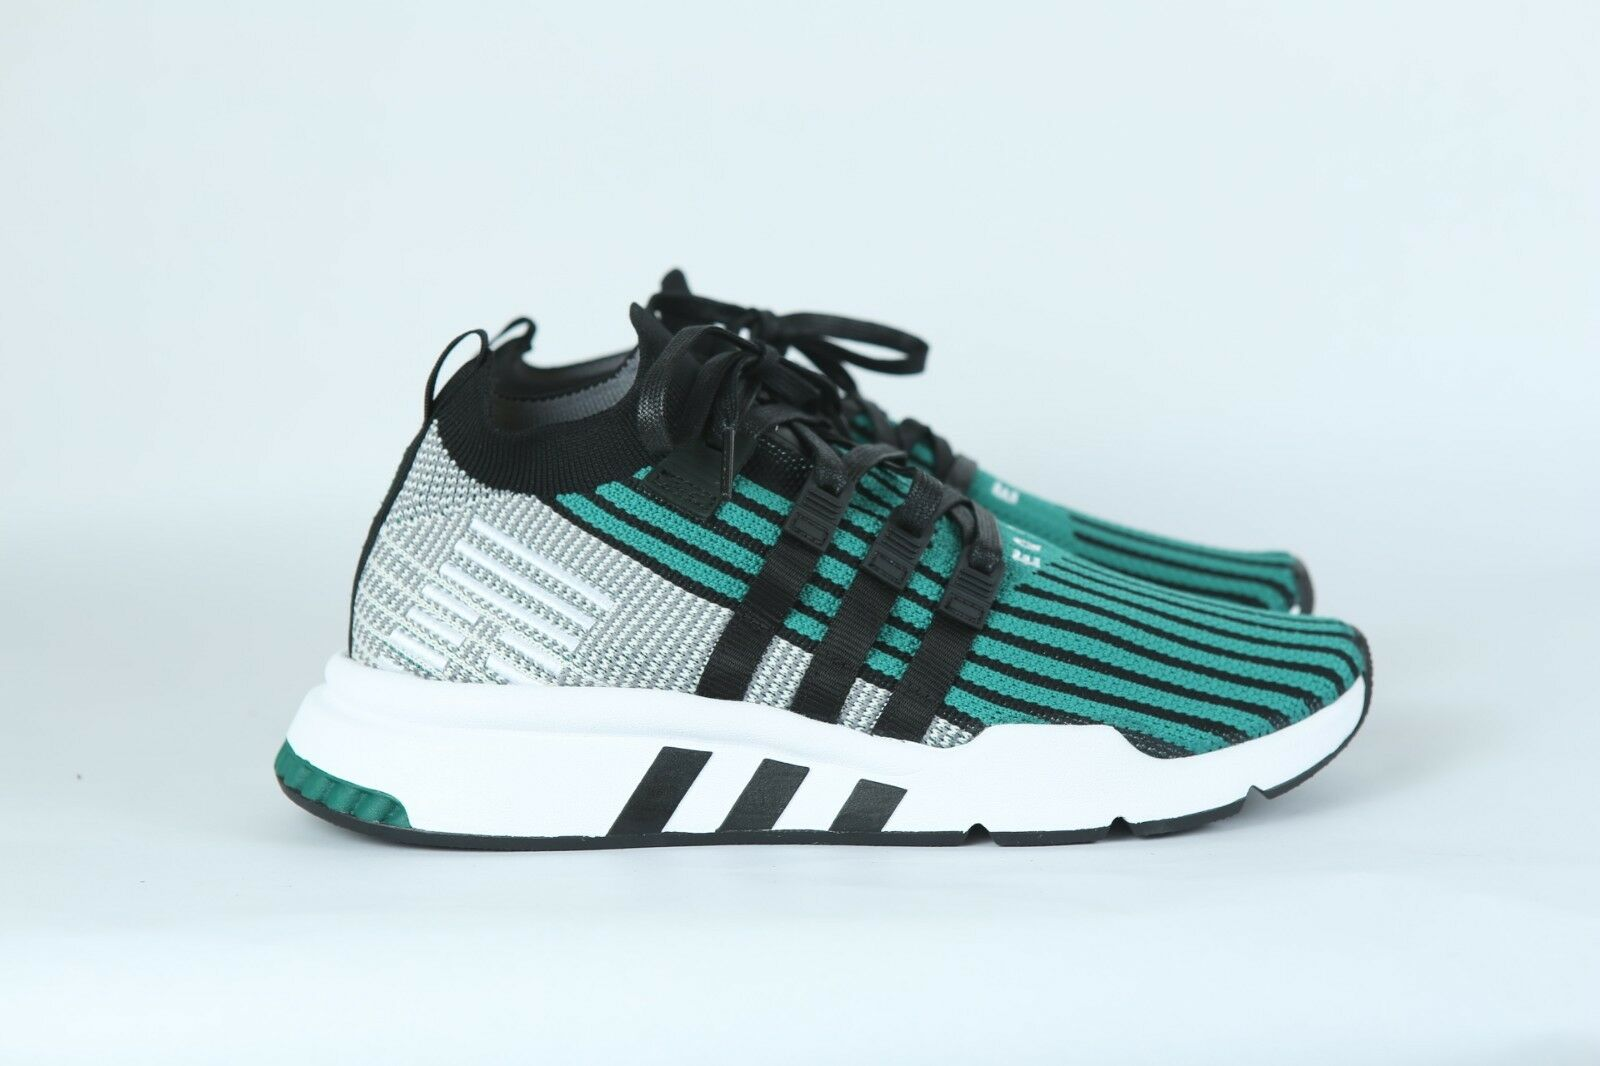 Adidas Original EQT Support MID ADV PK CQ2998 Sub GreenBlack Mens US Primeknit